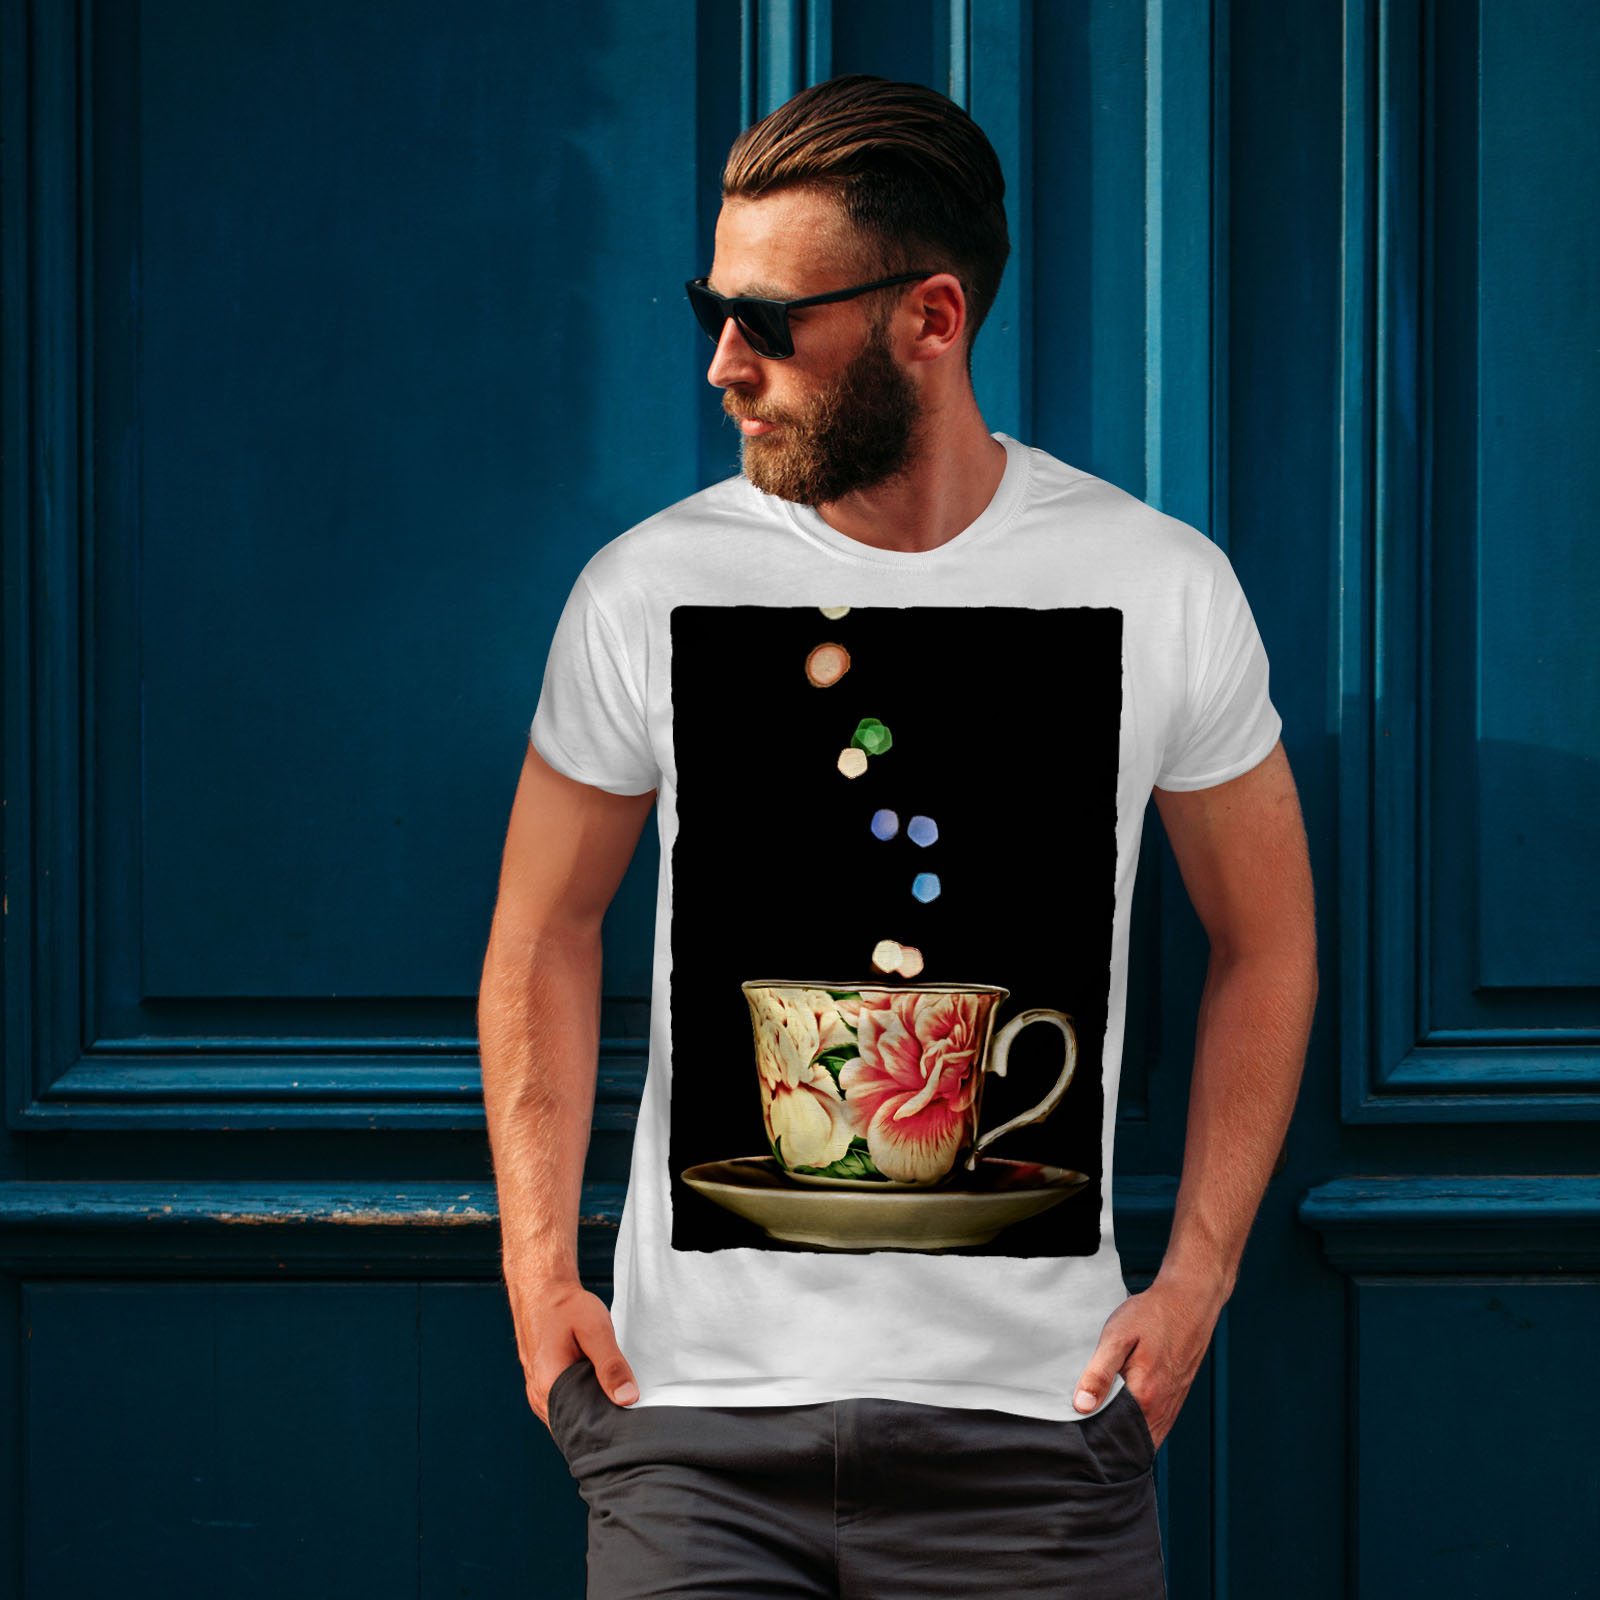 Wellcoda-Tea-Cup-Retro-Old-Mens-T-shirt-Smell-Graphic-Design-Printed-Tee thumbnail 10